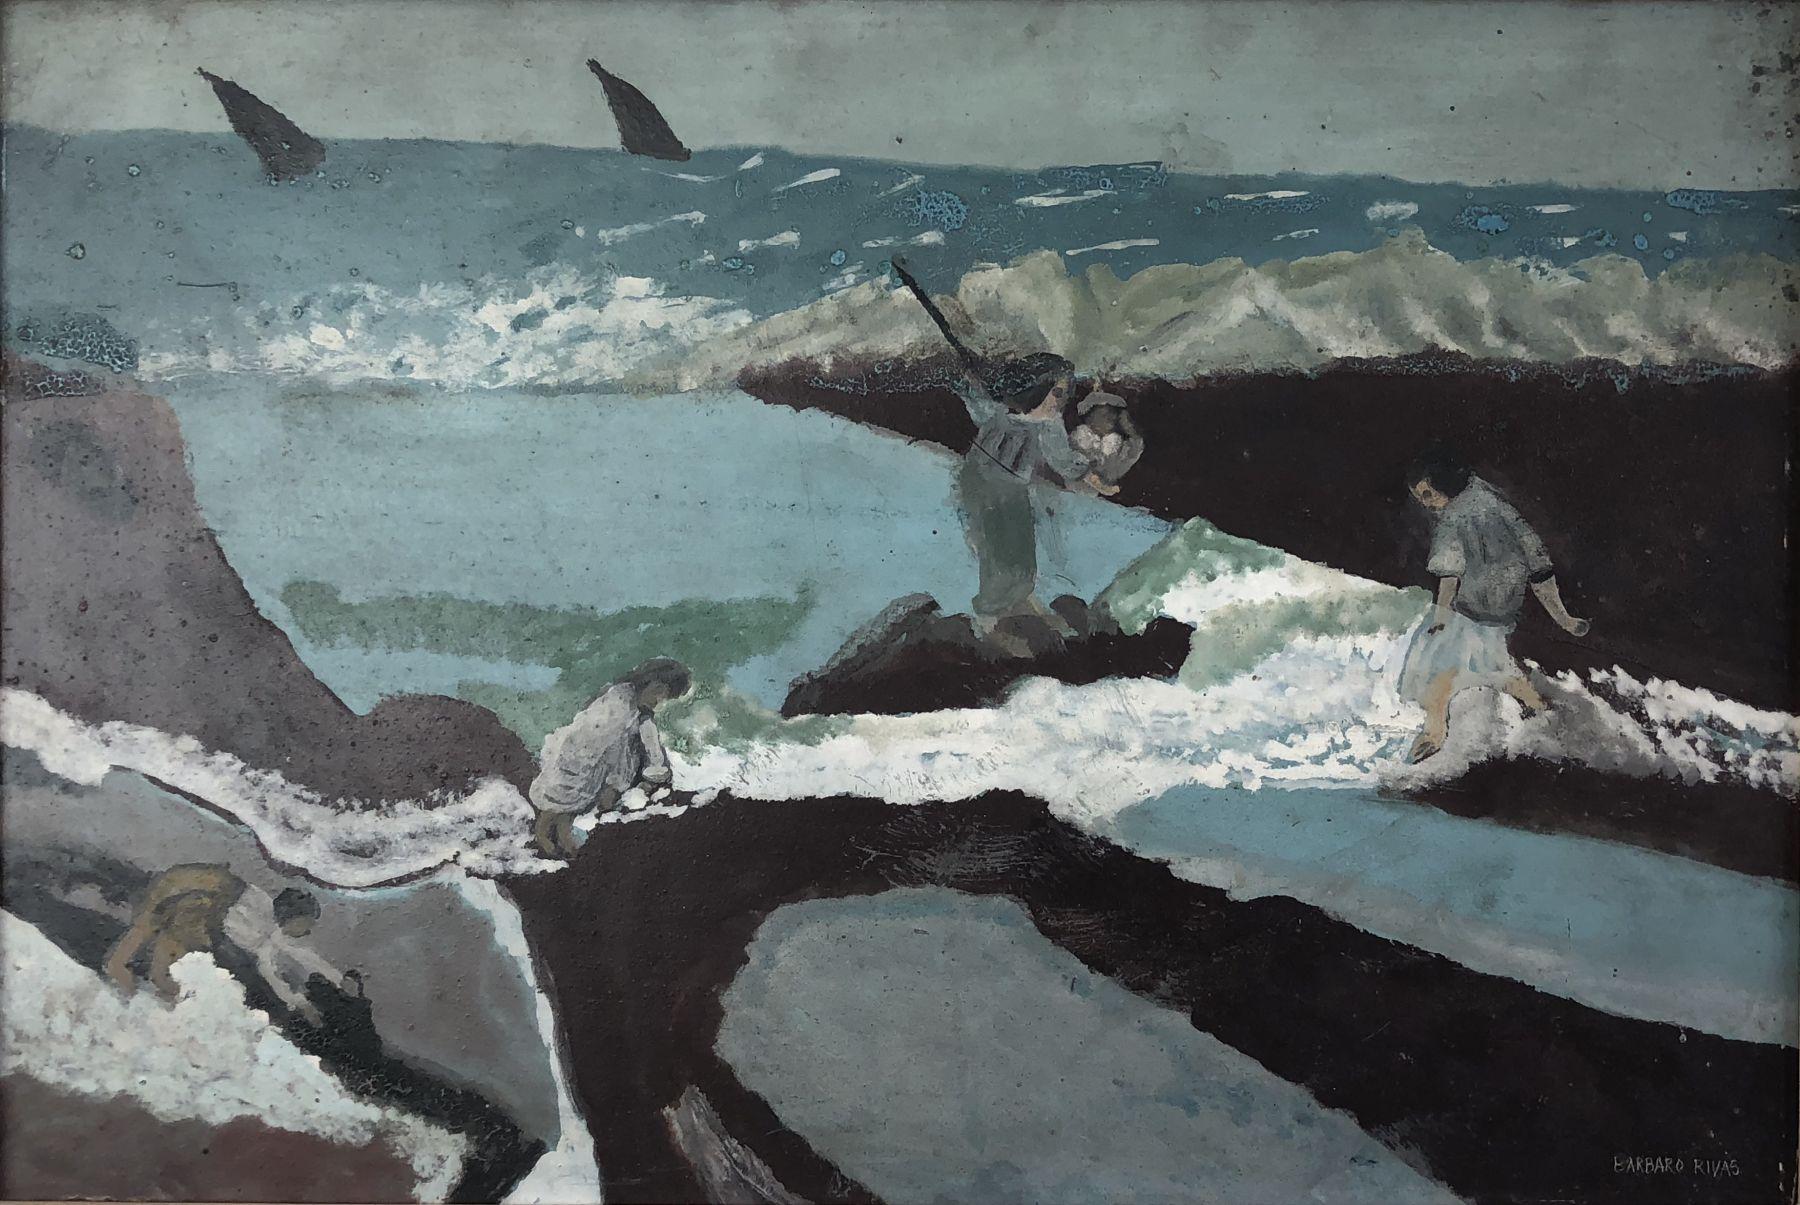 Bárbaro Rivas(1893-1967) Venezuela, La pesca milagrosa (The Miraculous Fishing), c. 1965, Enamel paint on Masonite, 13 x 19.25 in